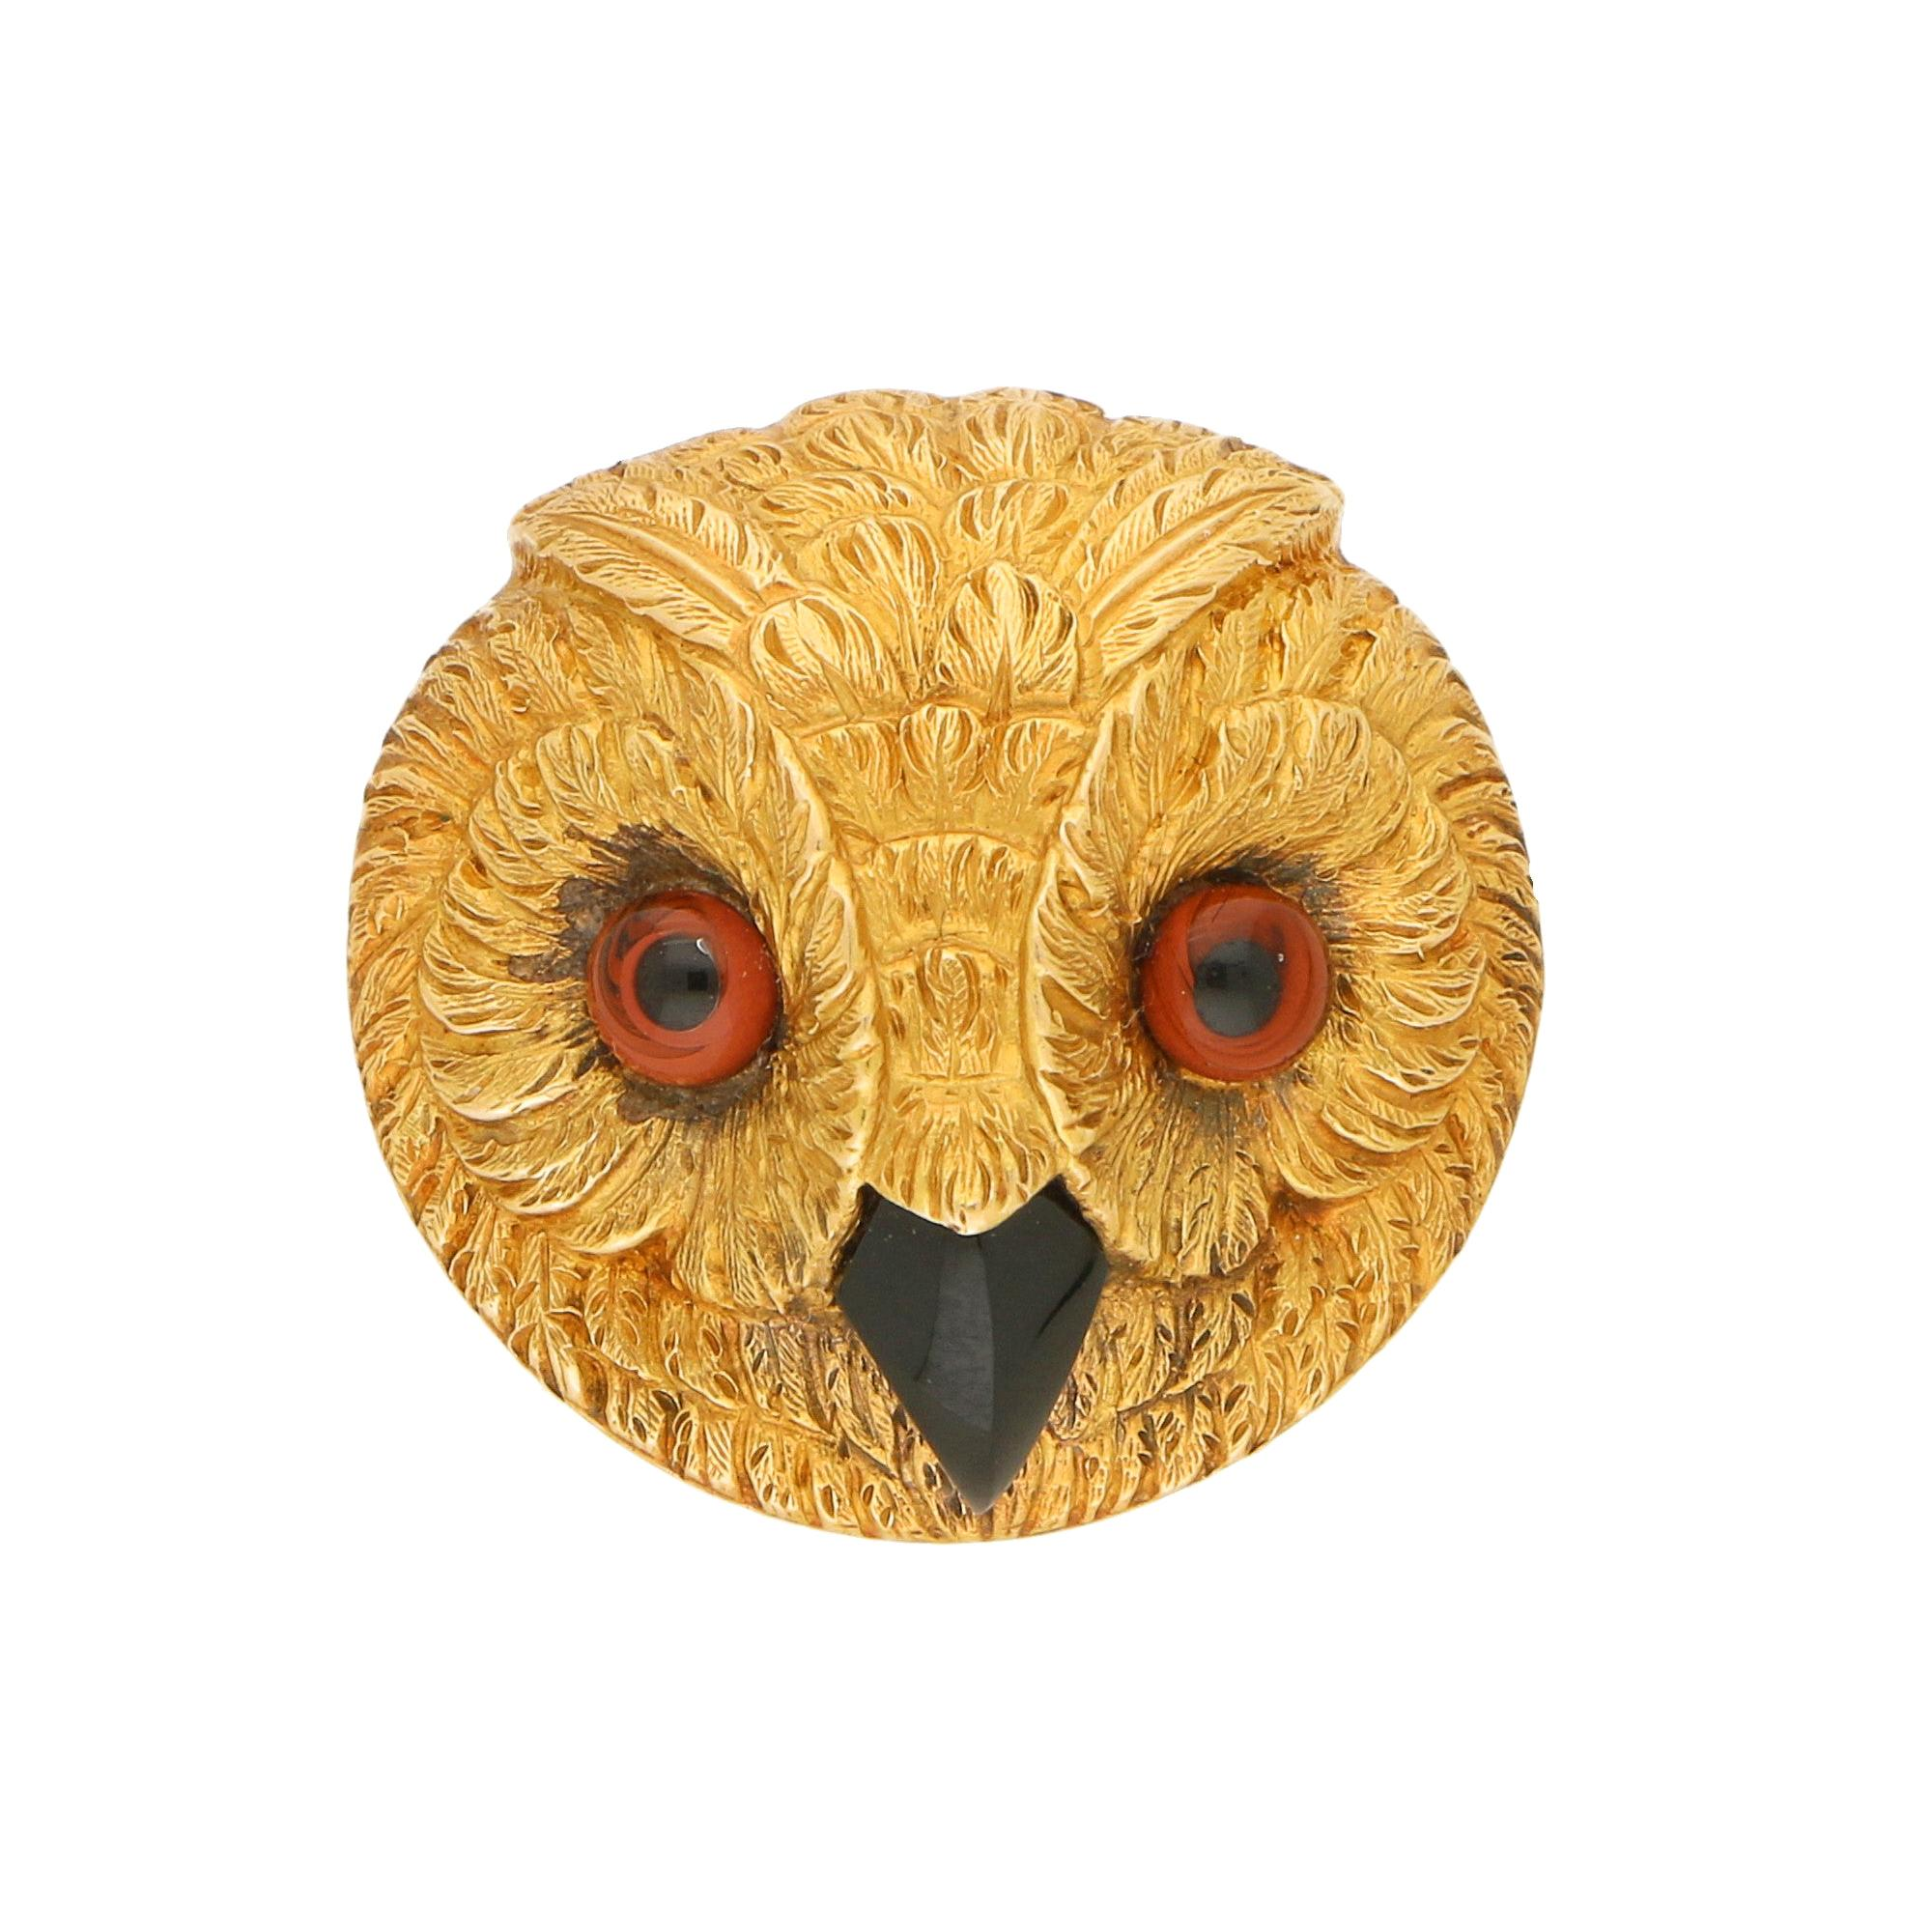 Victorian Owl Head Brooch in 9k Yellow Gold, circa 1880